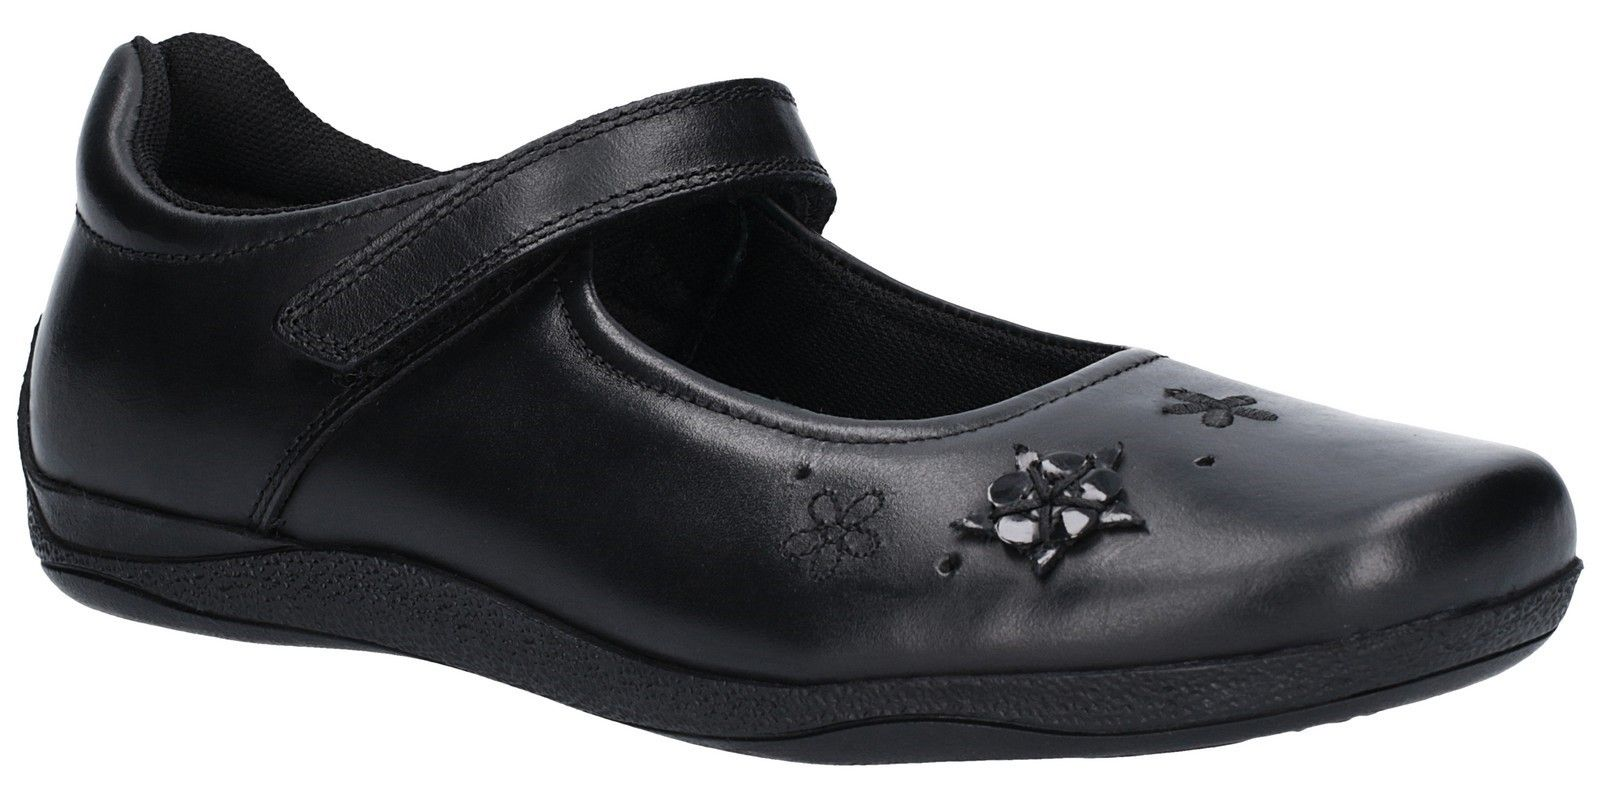 Candy Senior School Shoe